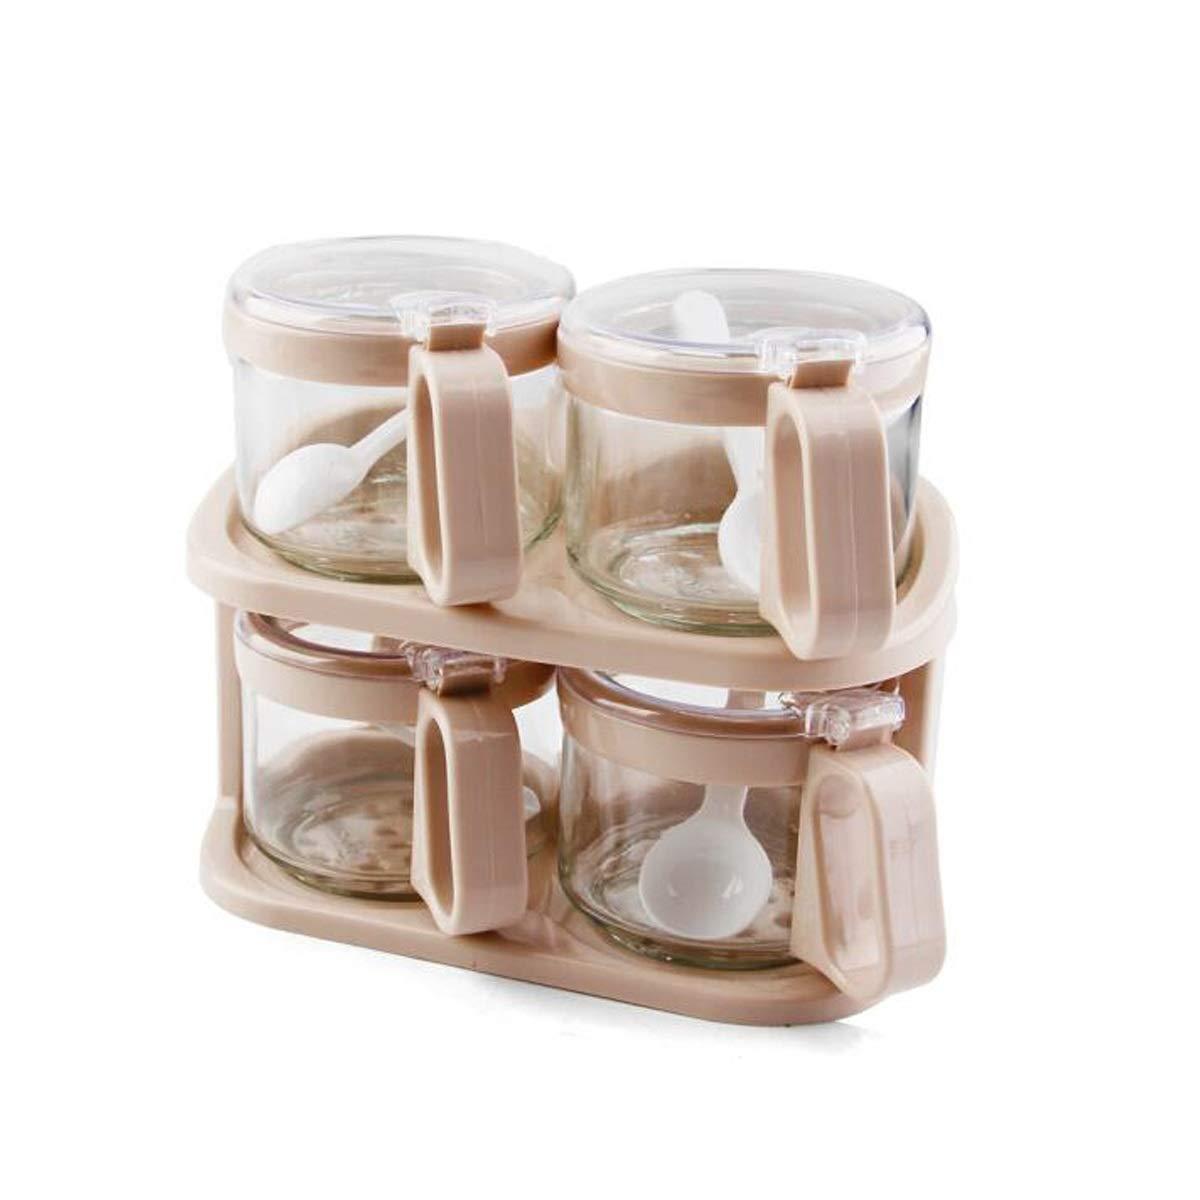 MINGRUIGONGMAO 4 Groups Of Seasoning Jar Seasoning Box Oil Pot Soy Sauce Vinegar Tank Plush toys (Color : Pink) by MINGRUIGONGMAO